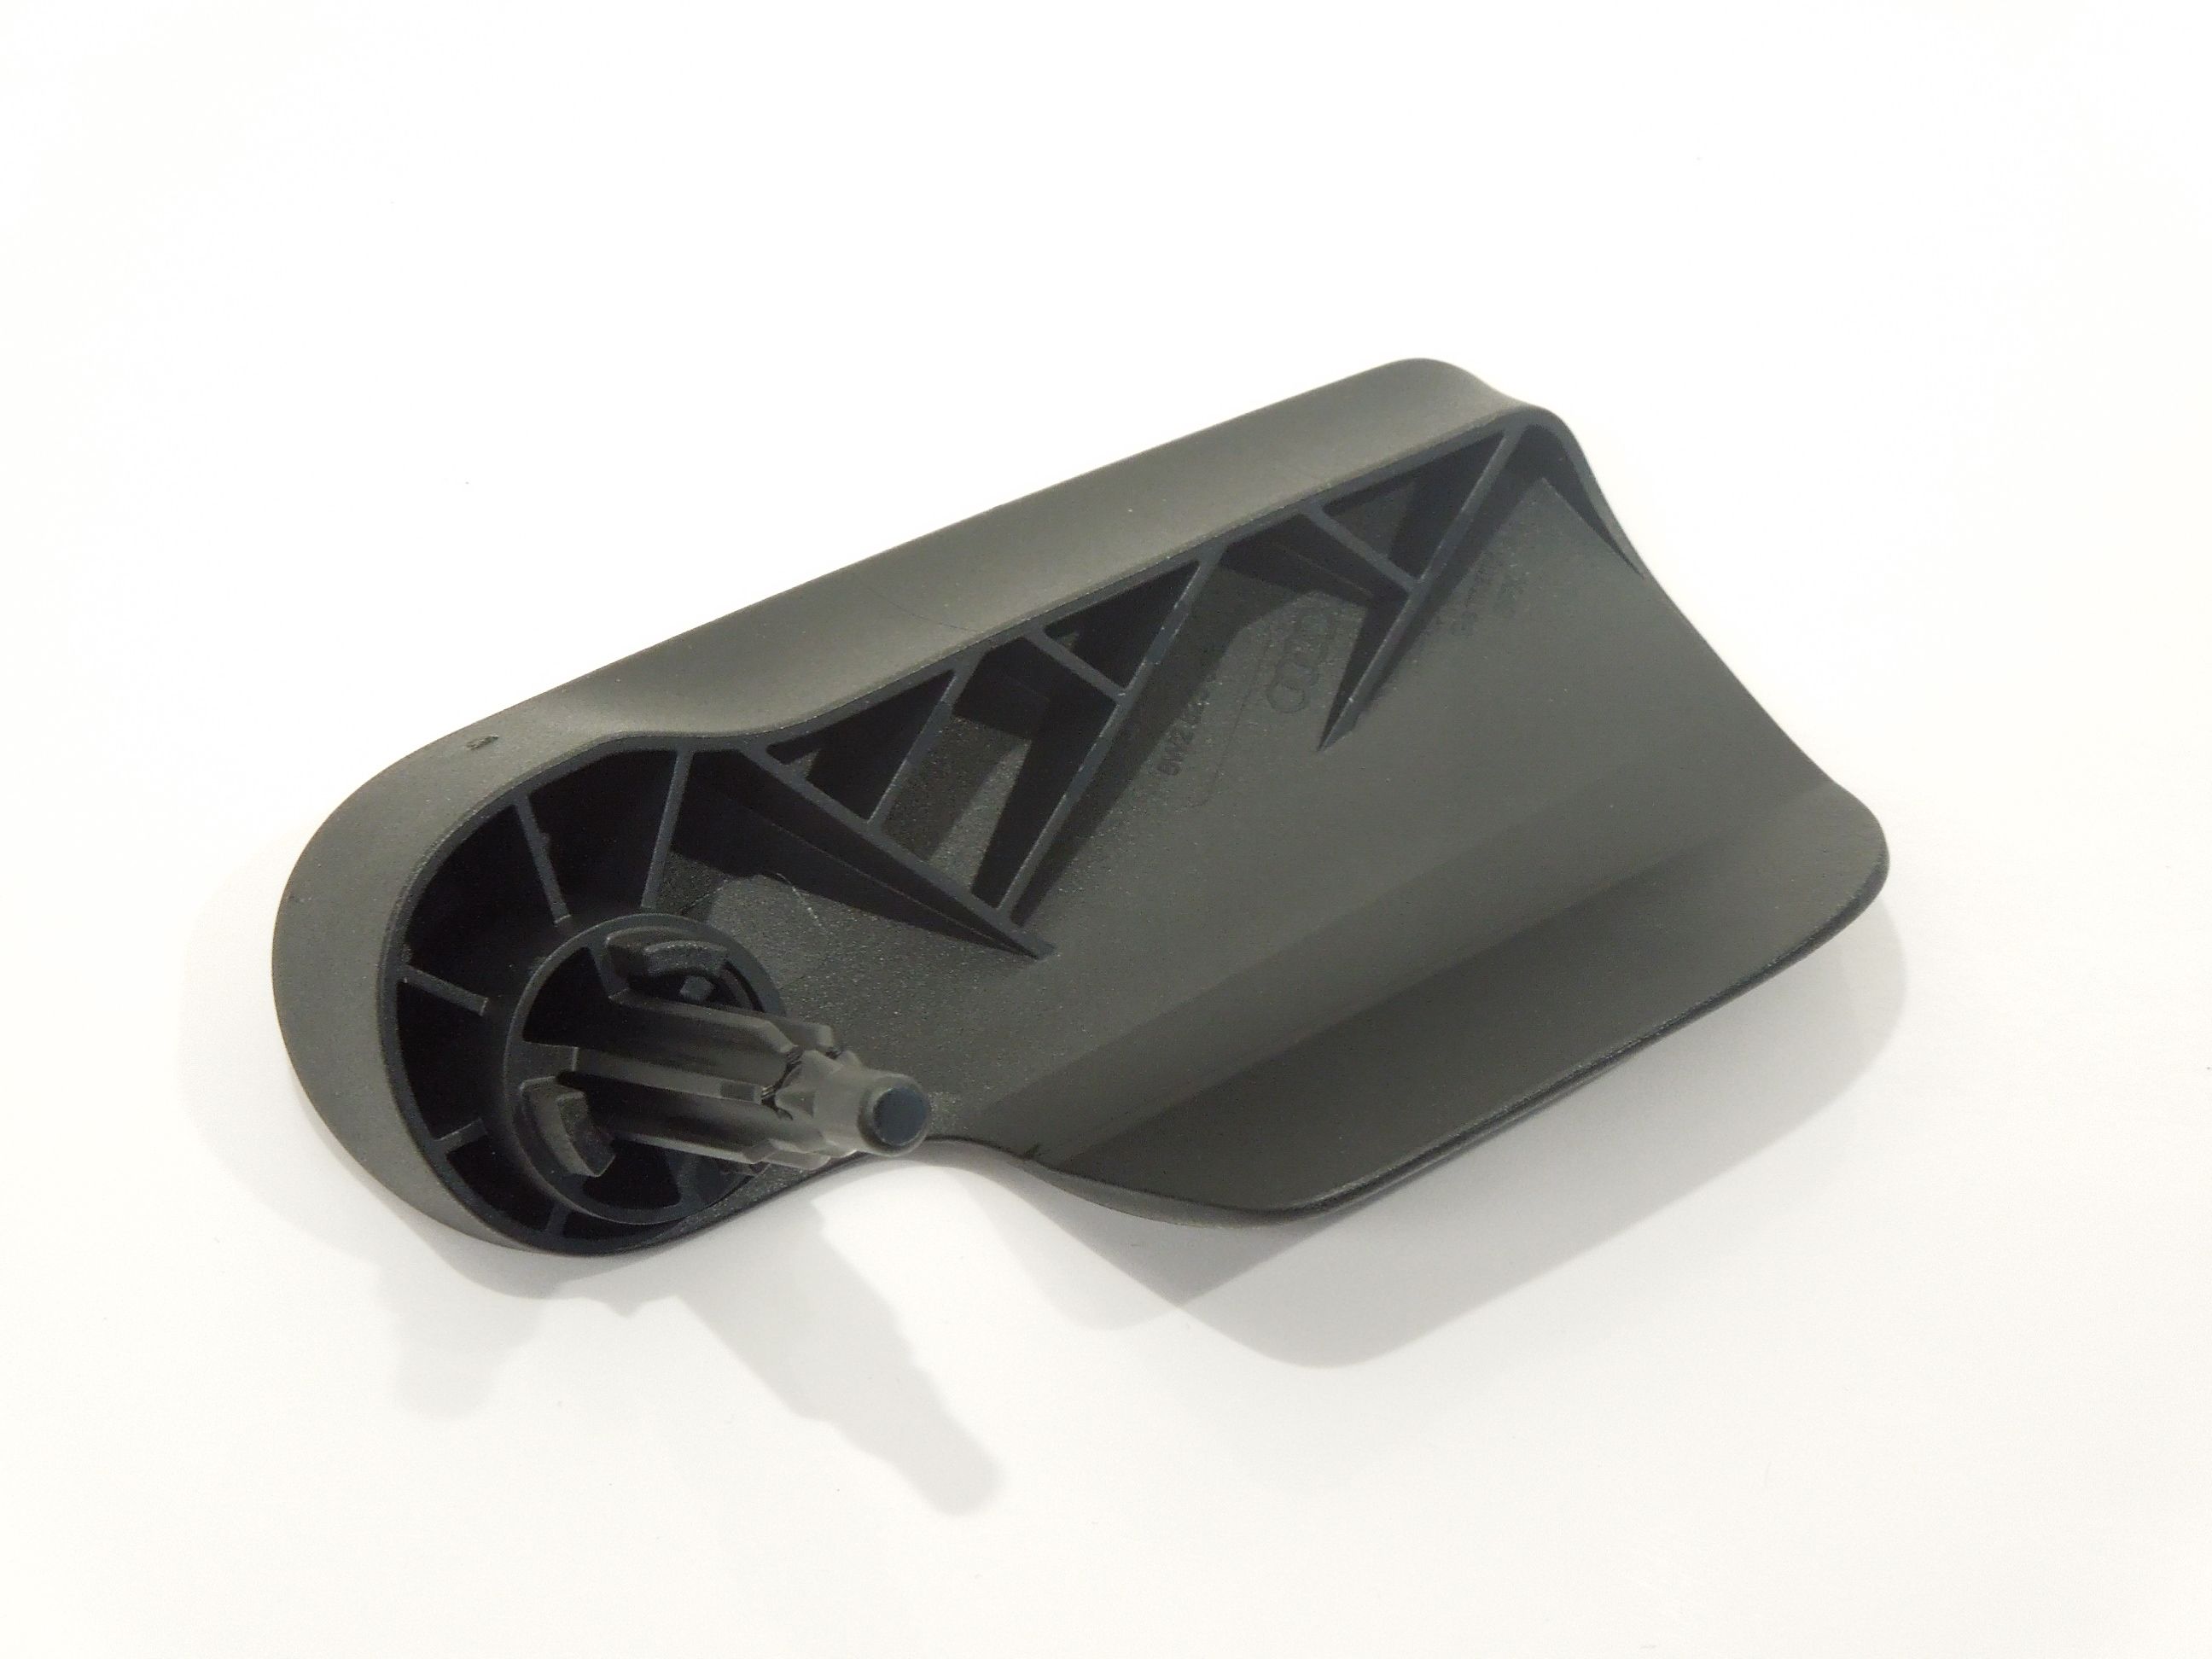 Audi A4 A5 B9 RHD Bonnet Release Handle Lever Black New Genuine 8W2823533C4PK